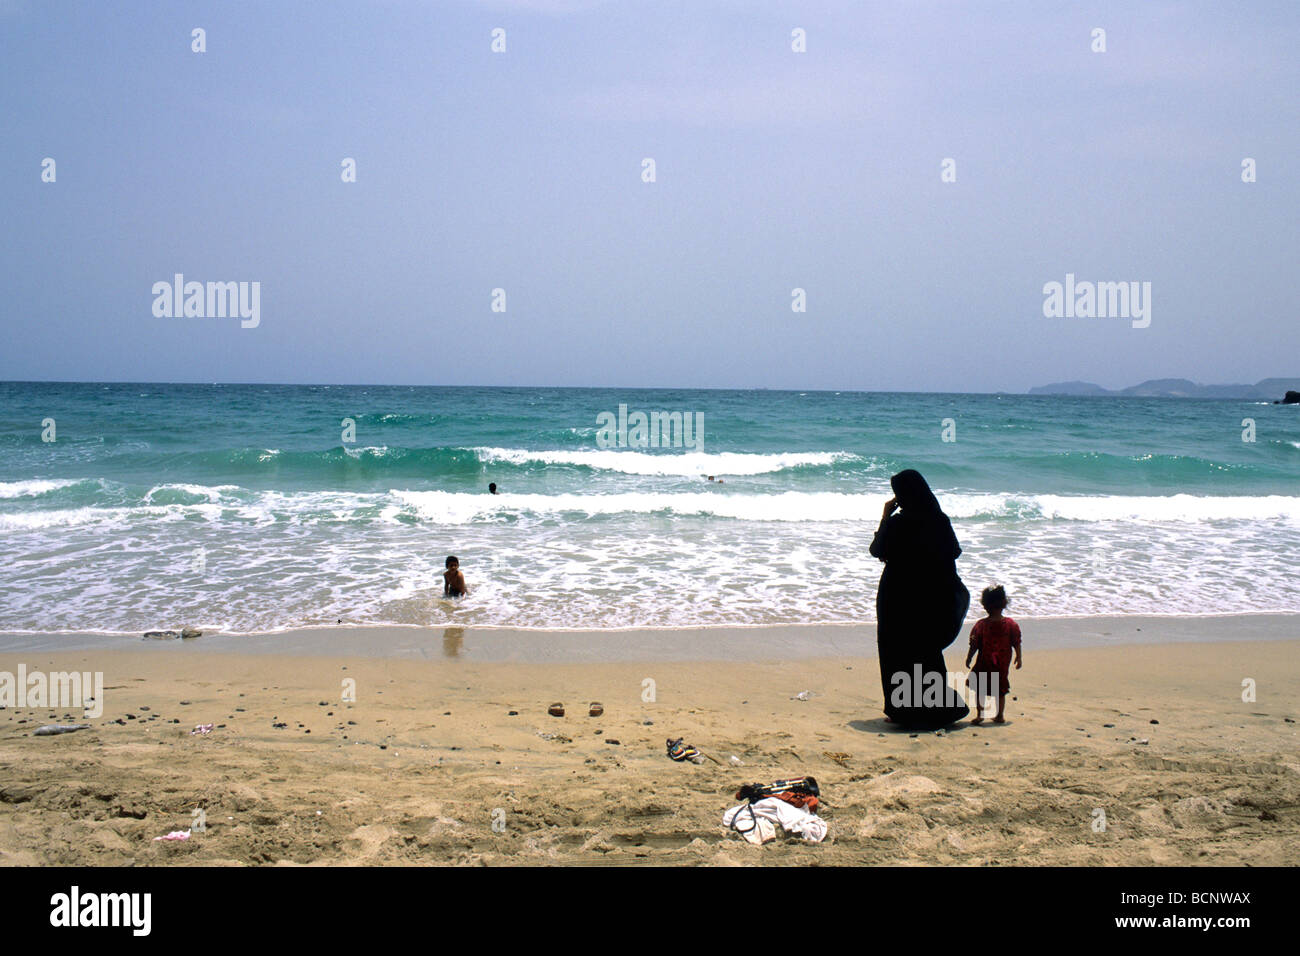 yemen aden - Stock Image